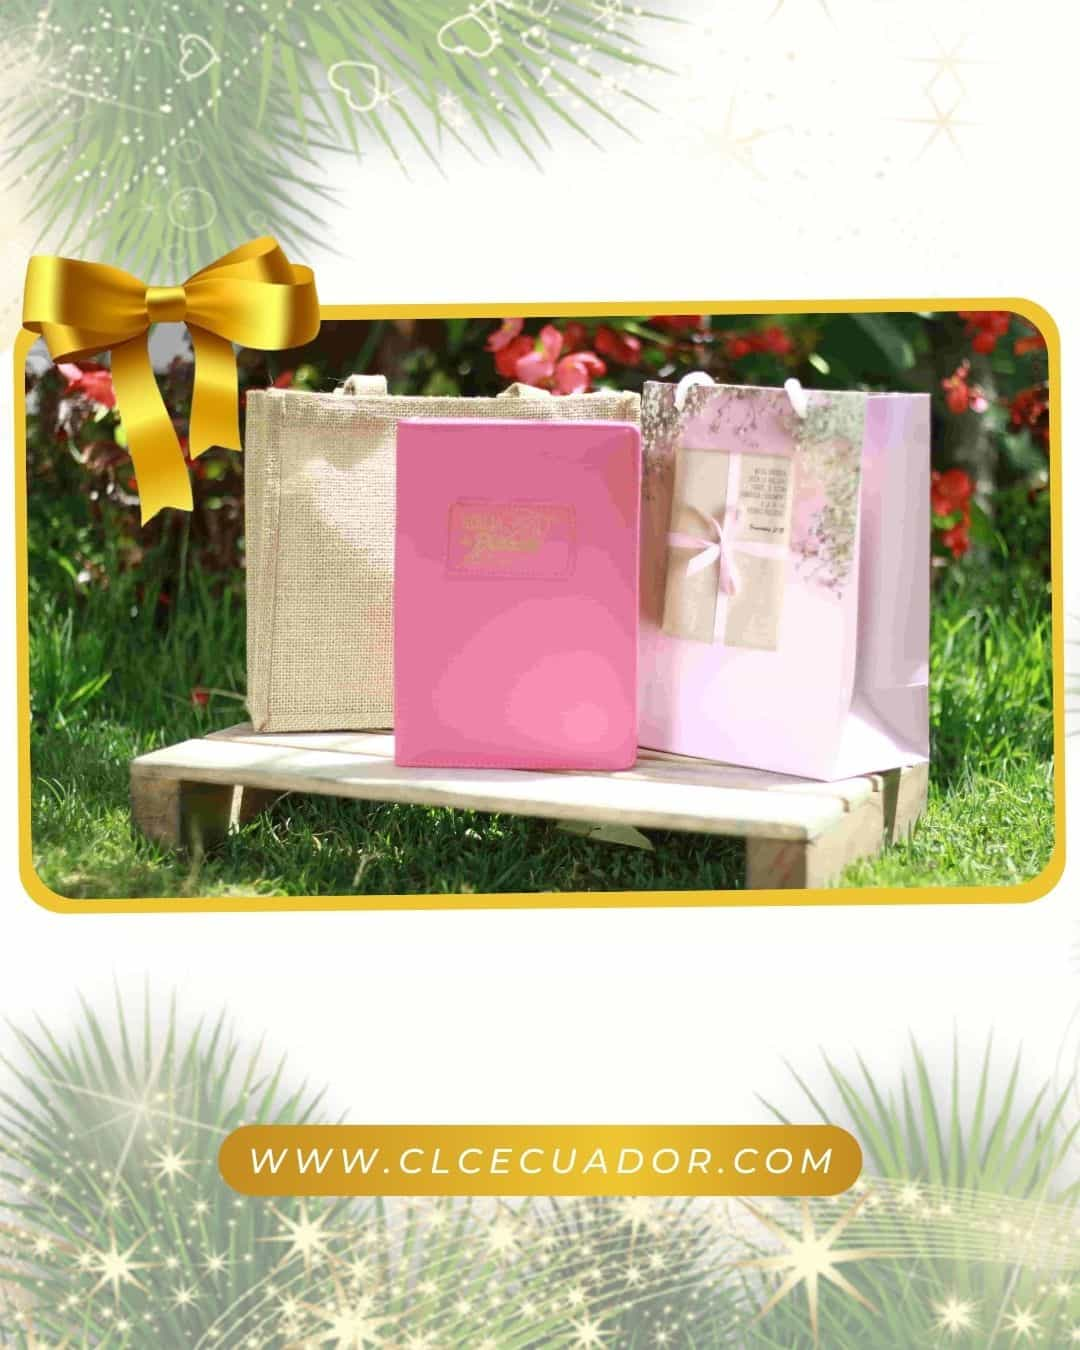 Biblia RVR60 Promesas Rosa Acolchada con Cierre